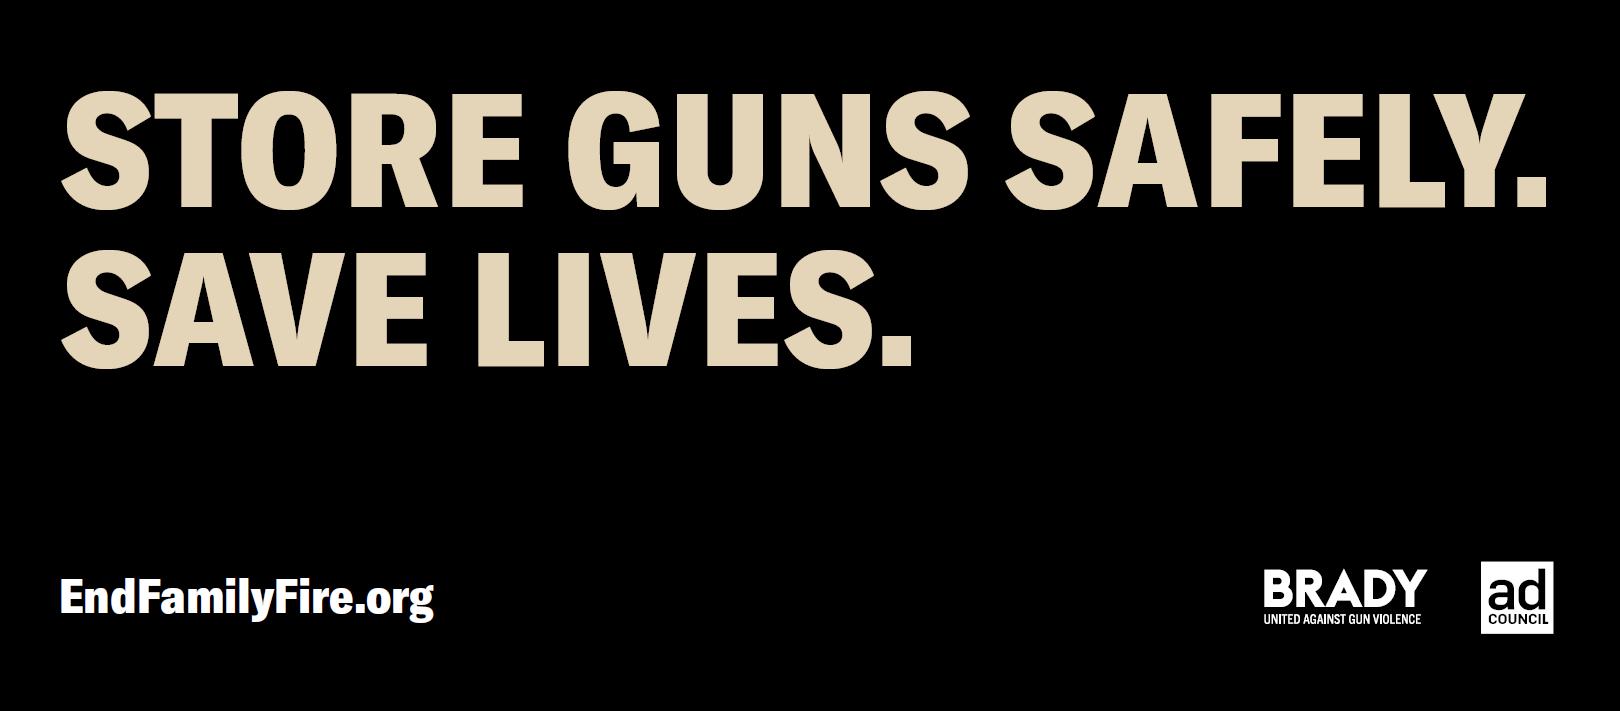 Store Guns Safely